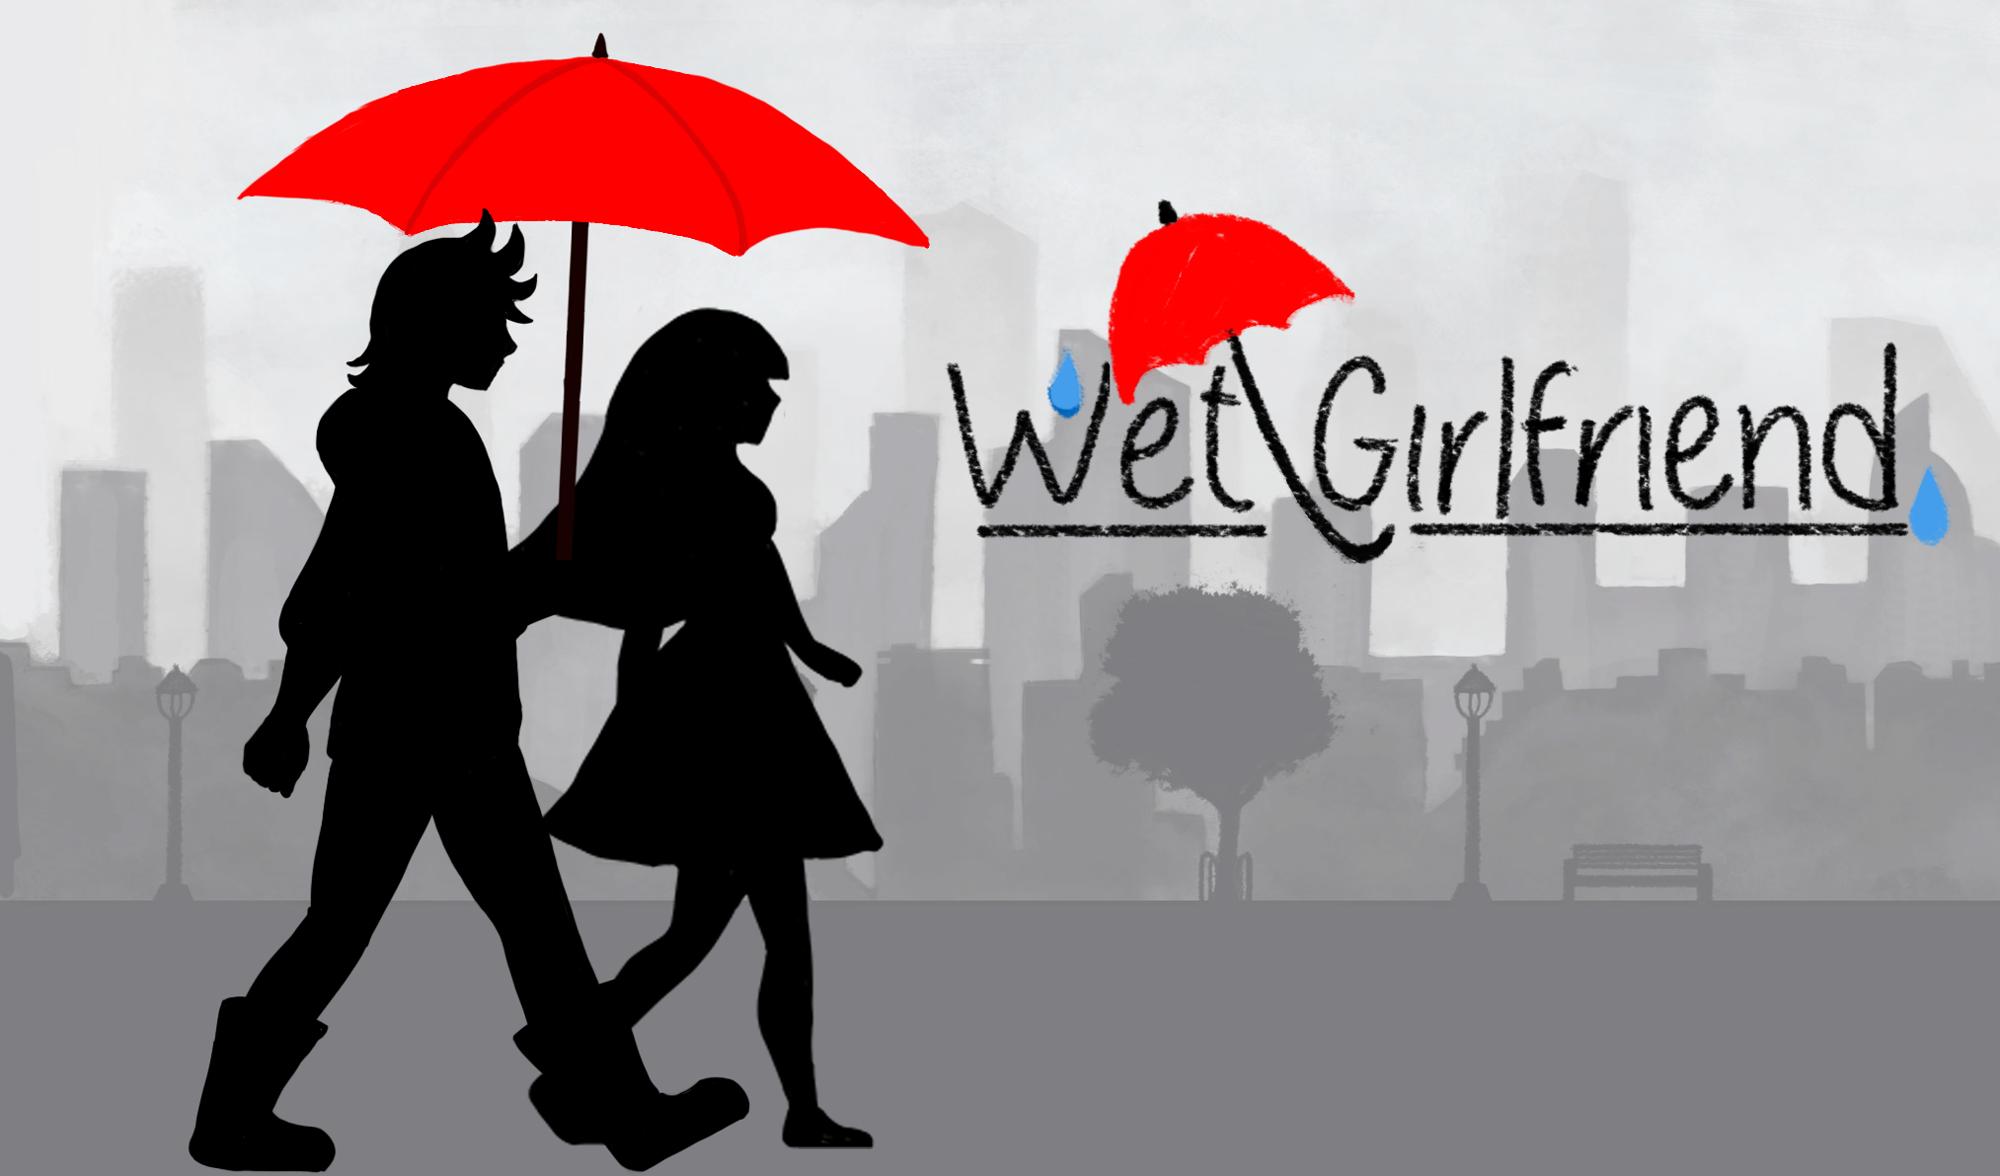 Wet Girlfriend